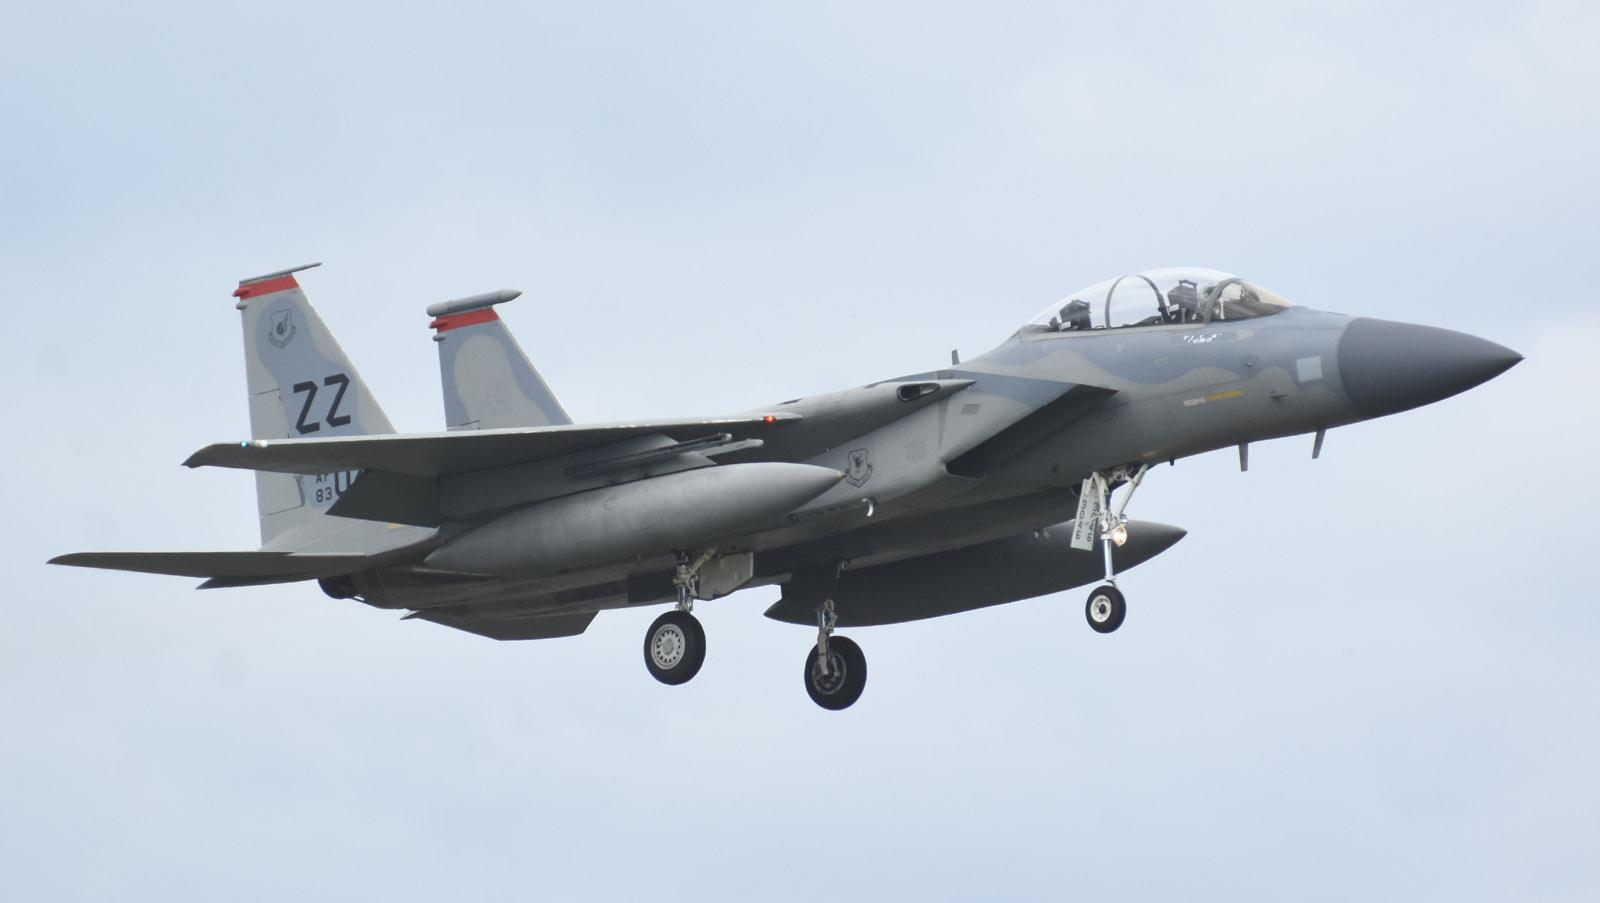 F15d180708g053